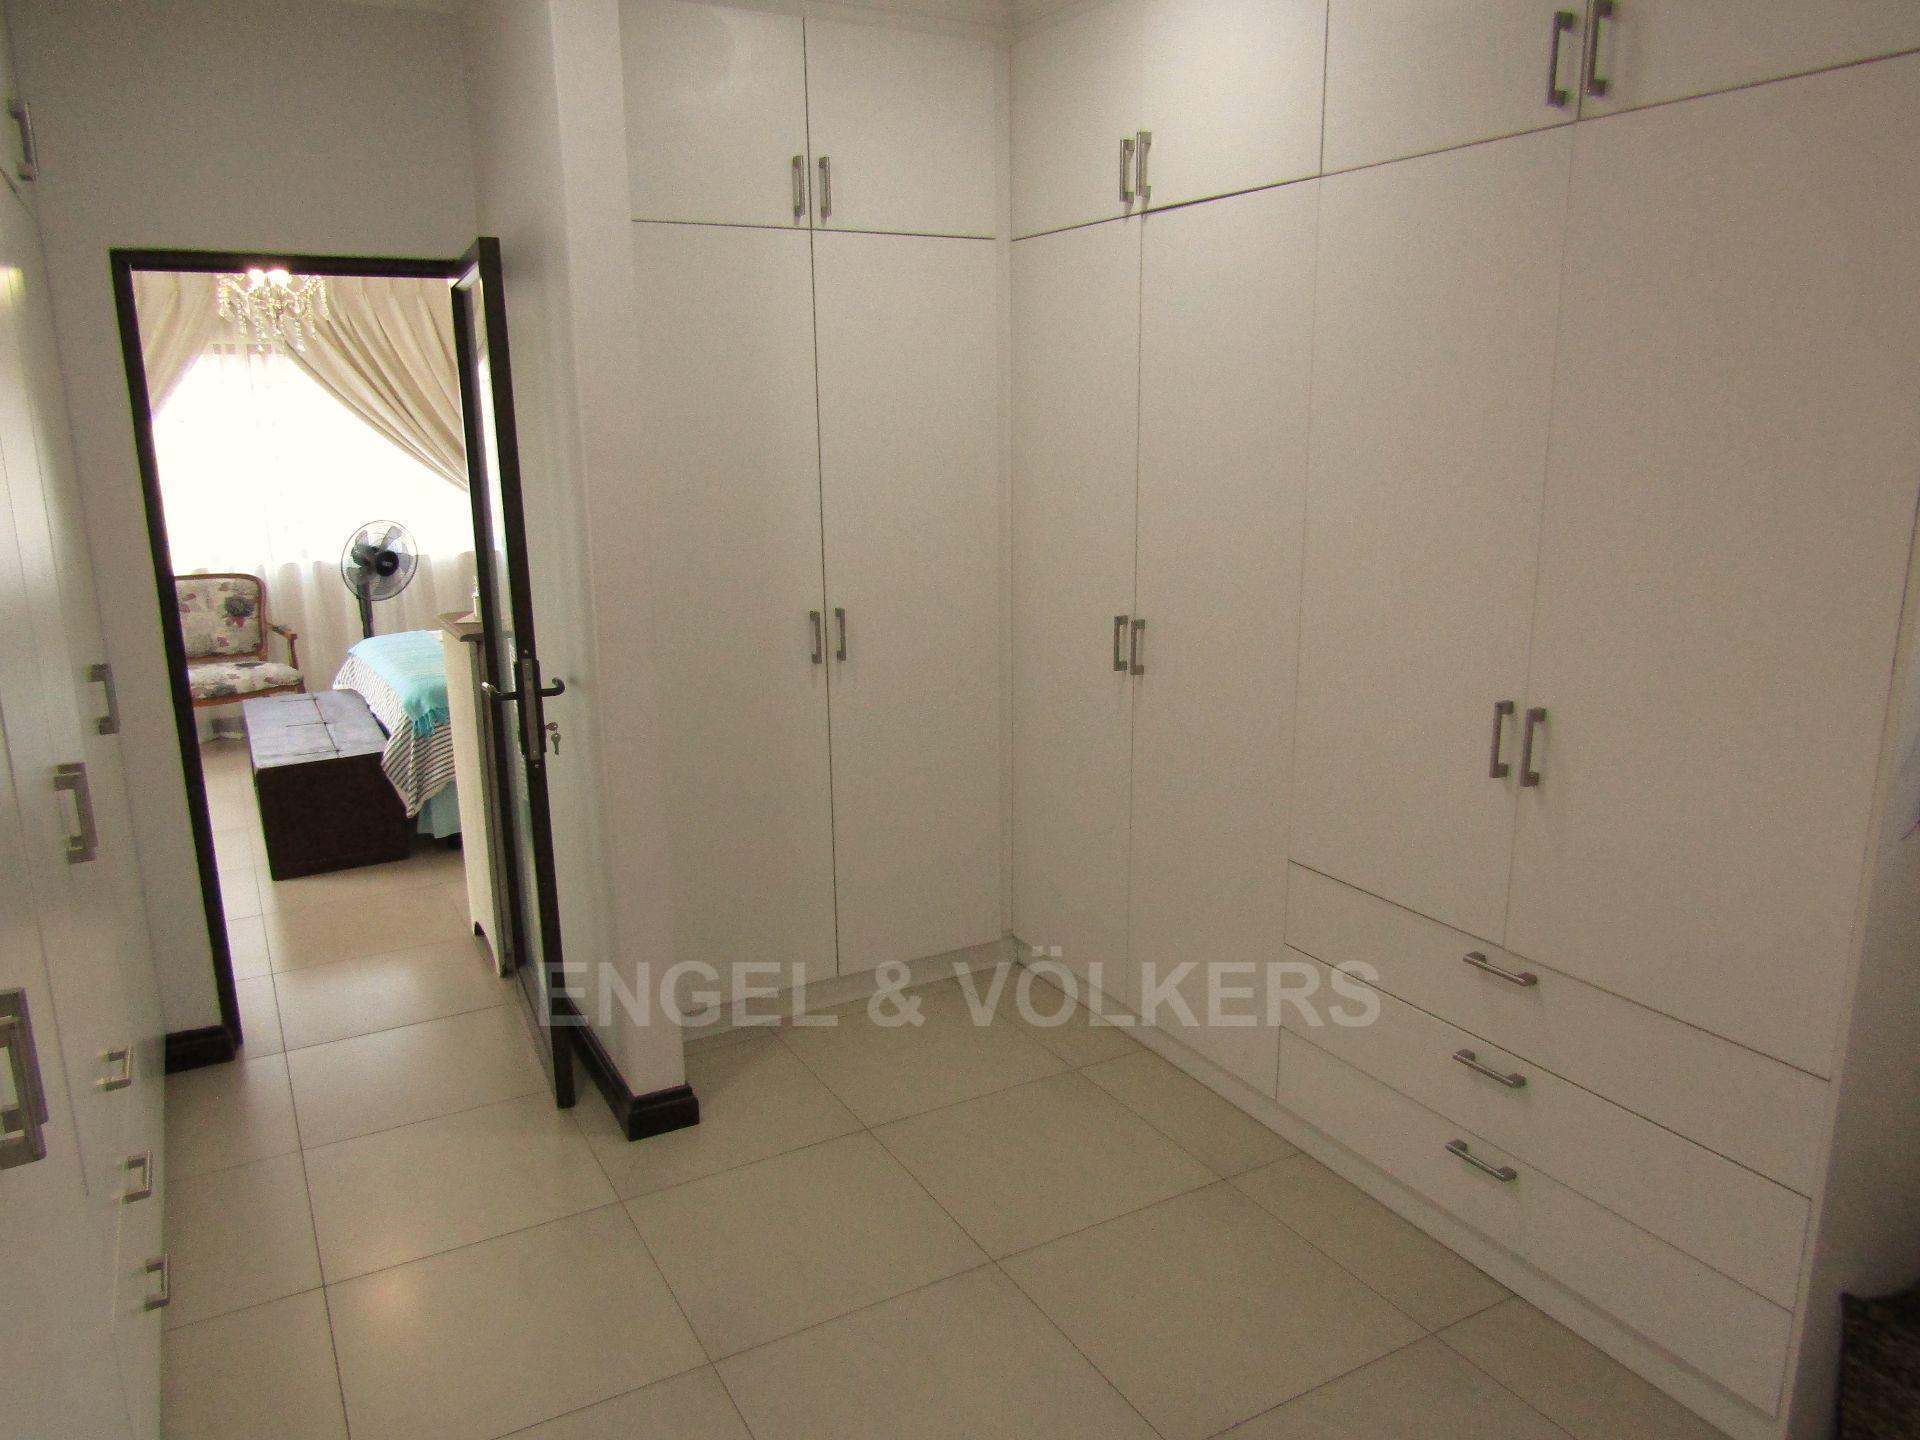 Lifestyle Estate property for sale. Ref No: 13458759. Picture no 16